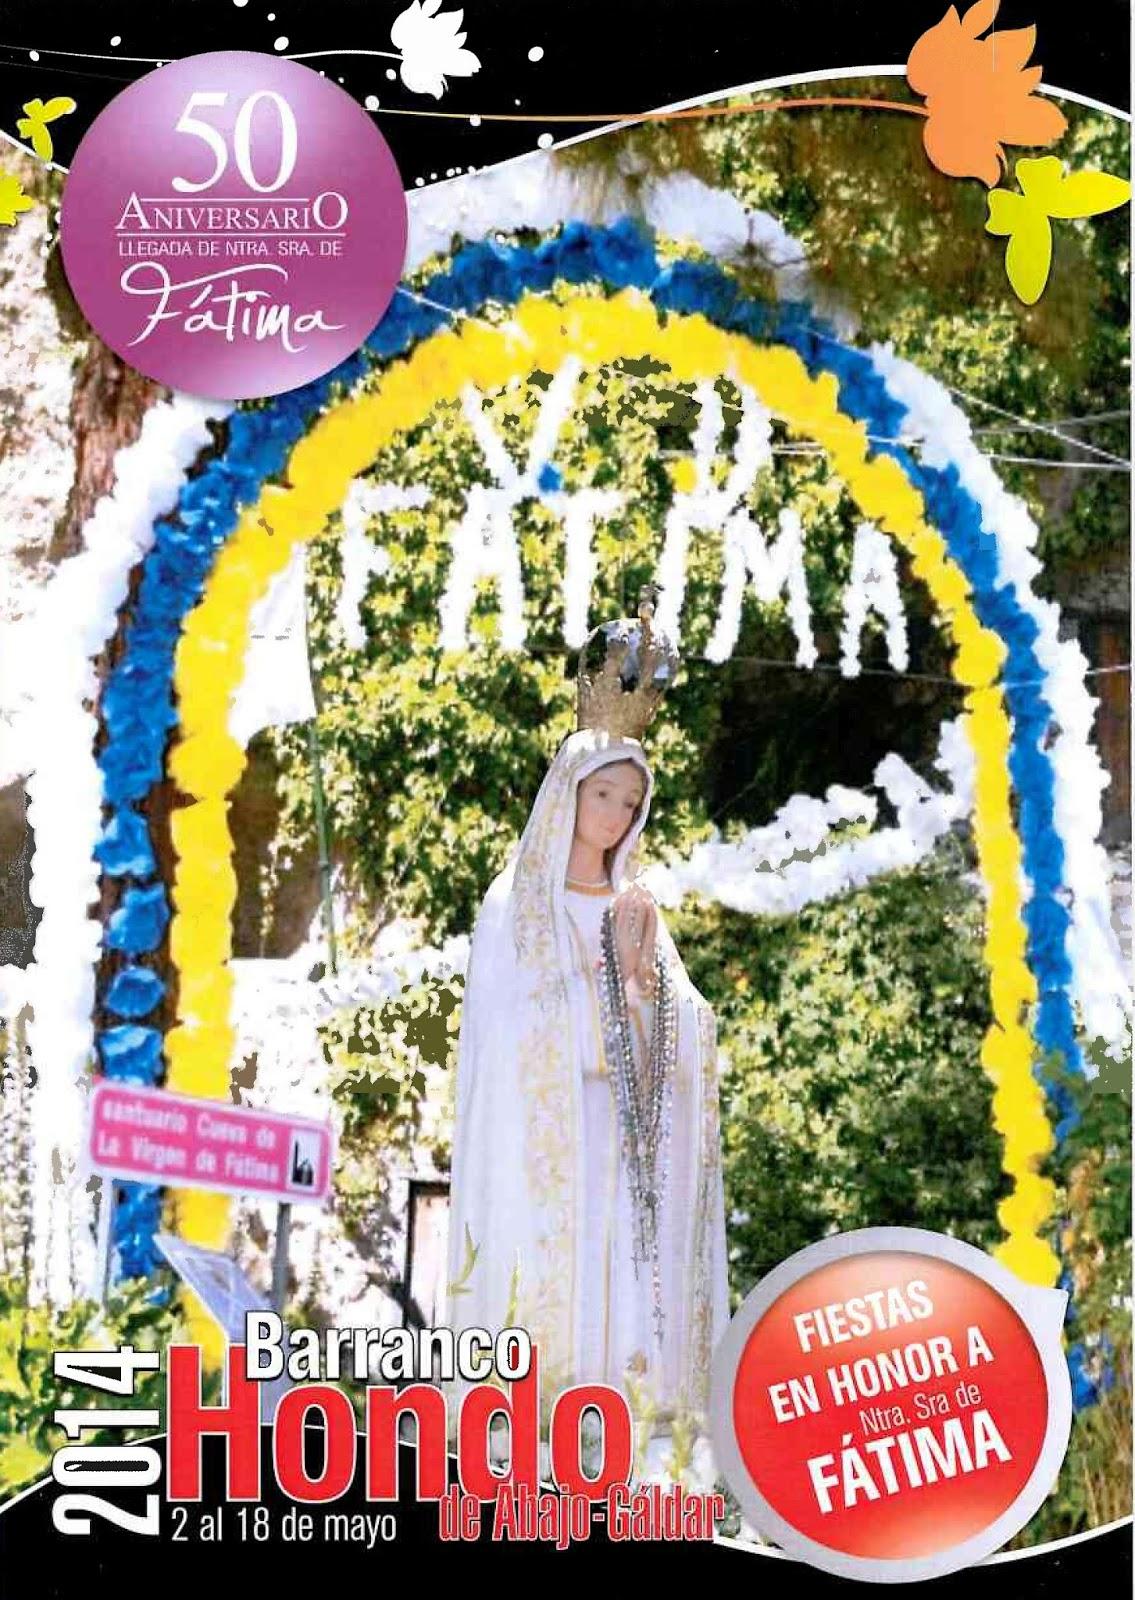 http://radiogaldar.blogspot.com.es/p/programa-de-fiestas.html